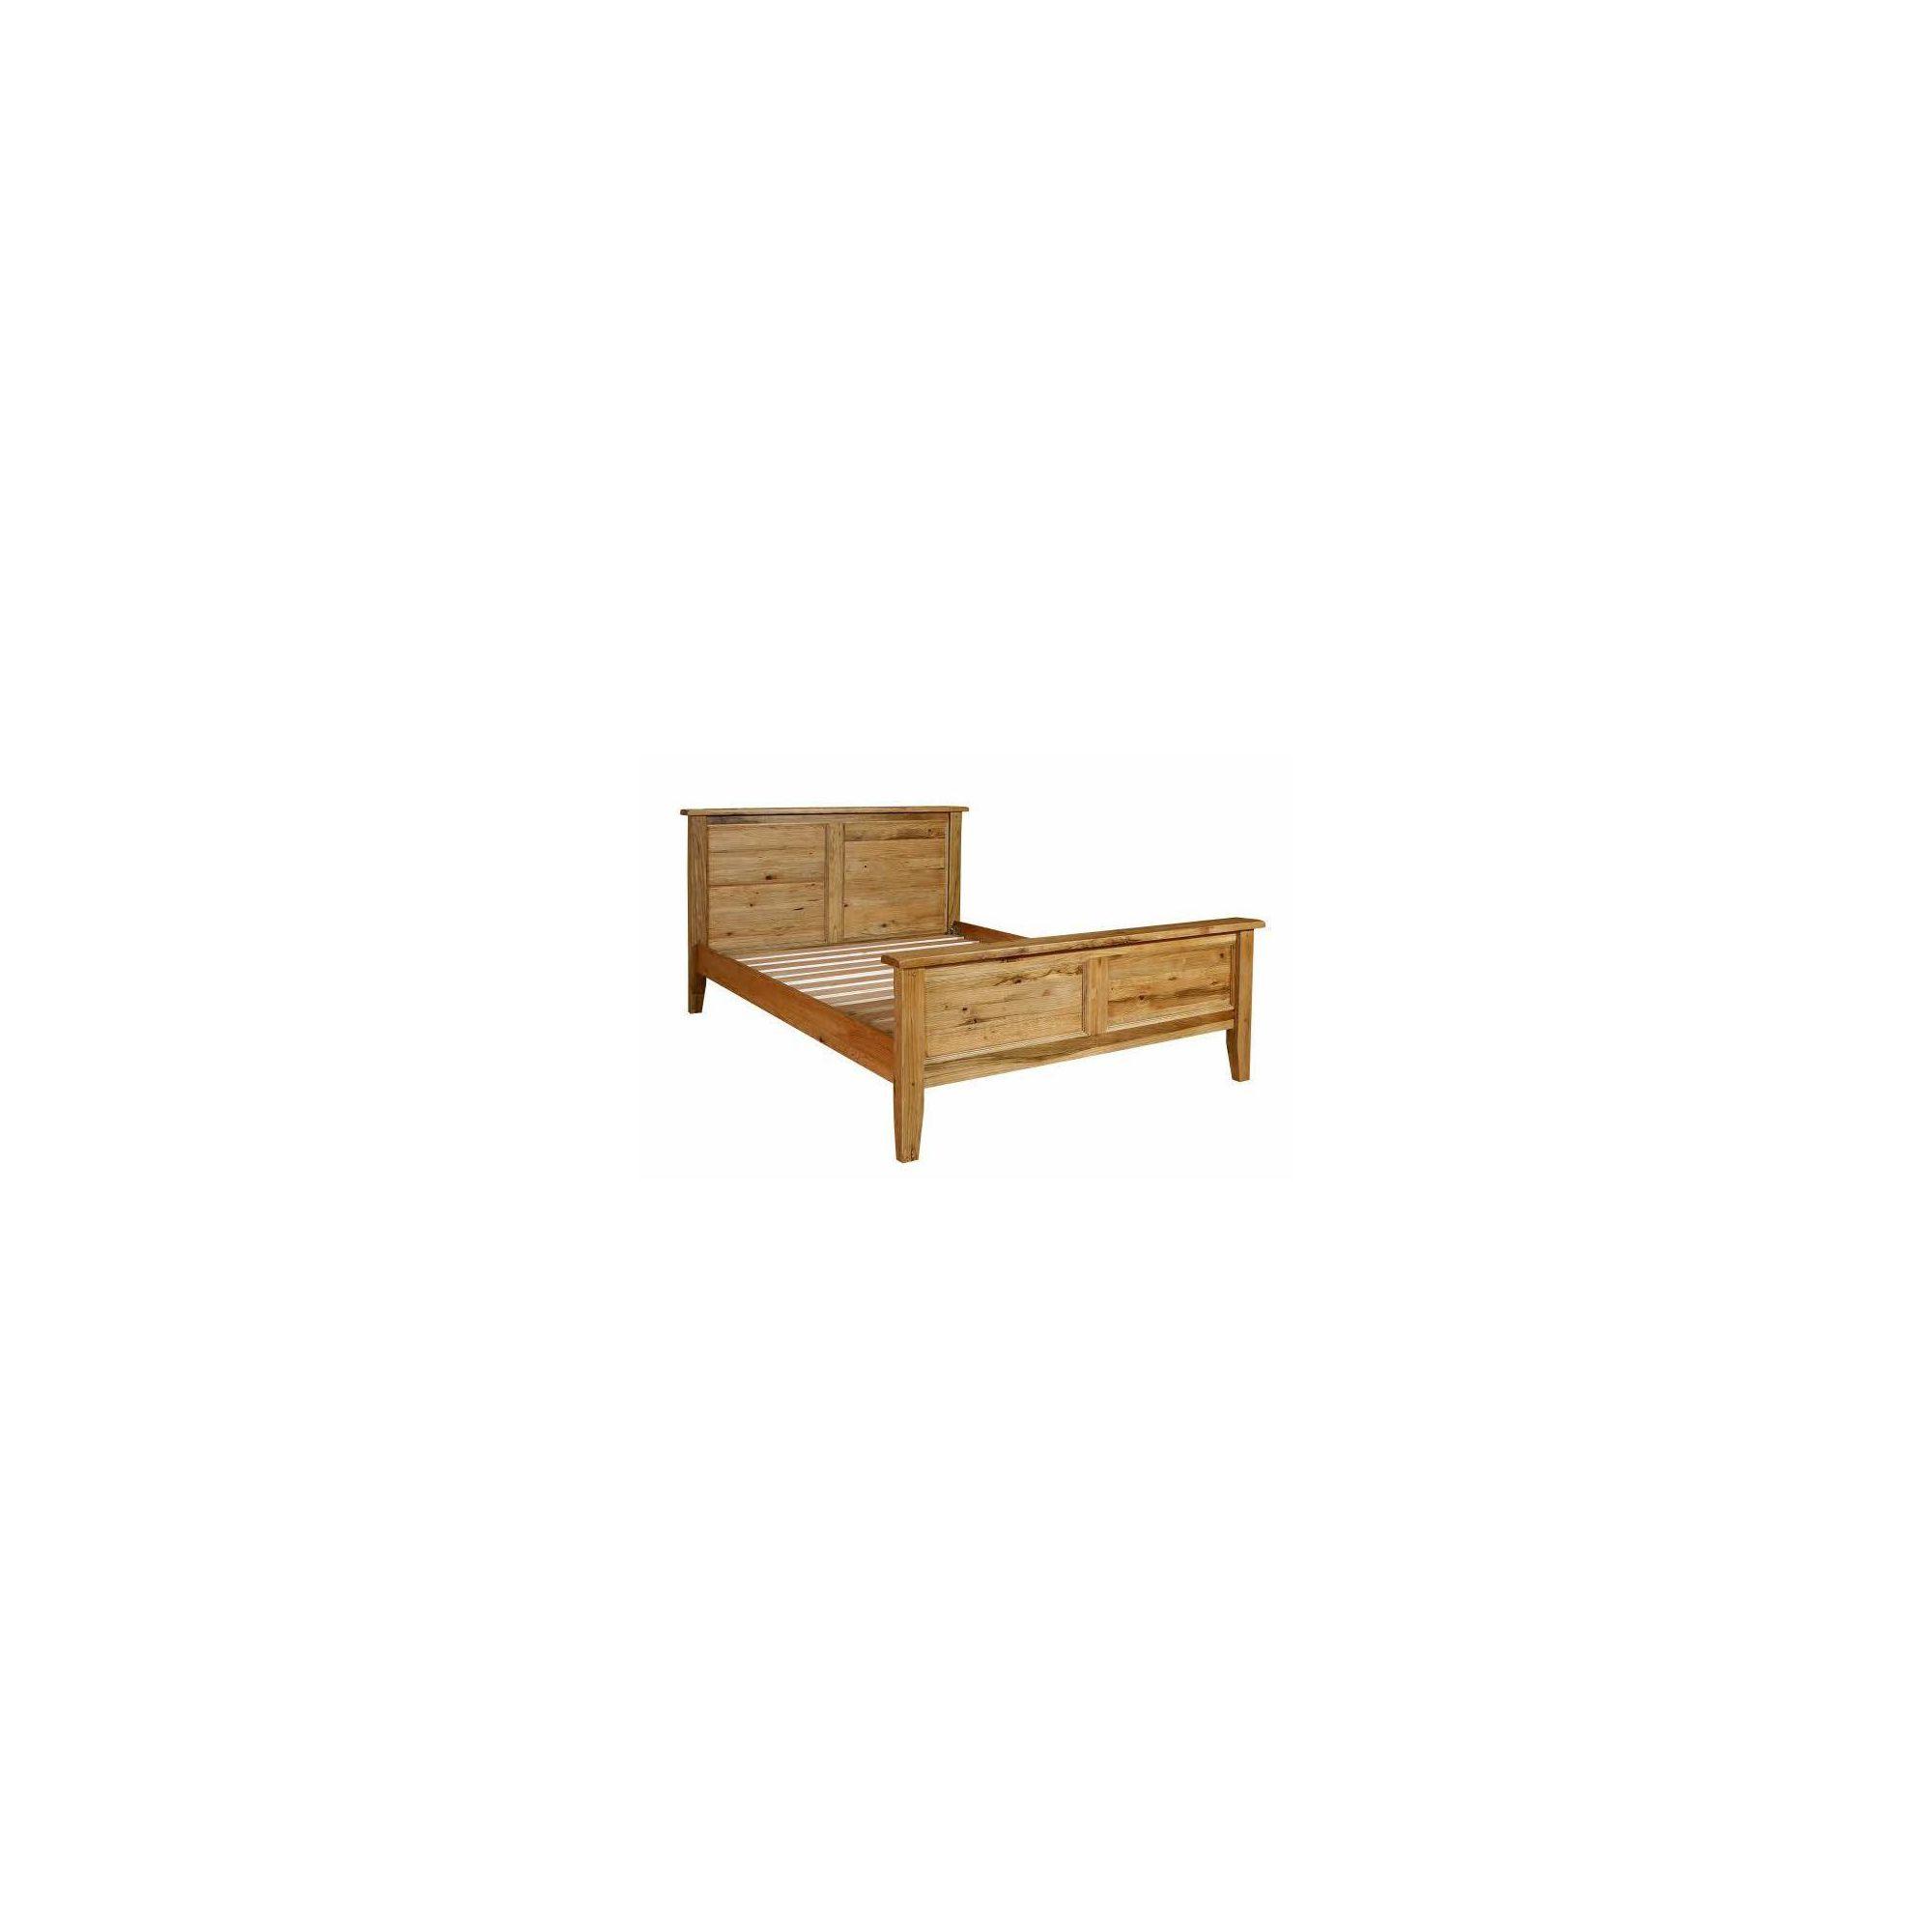 Kelburn Furniture Parnell Paneled Bed Frame - King at Tesco Direct